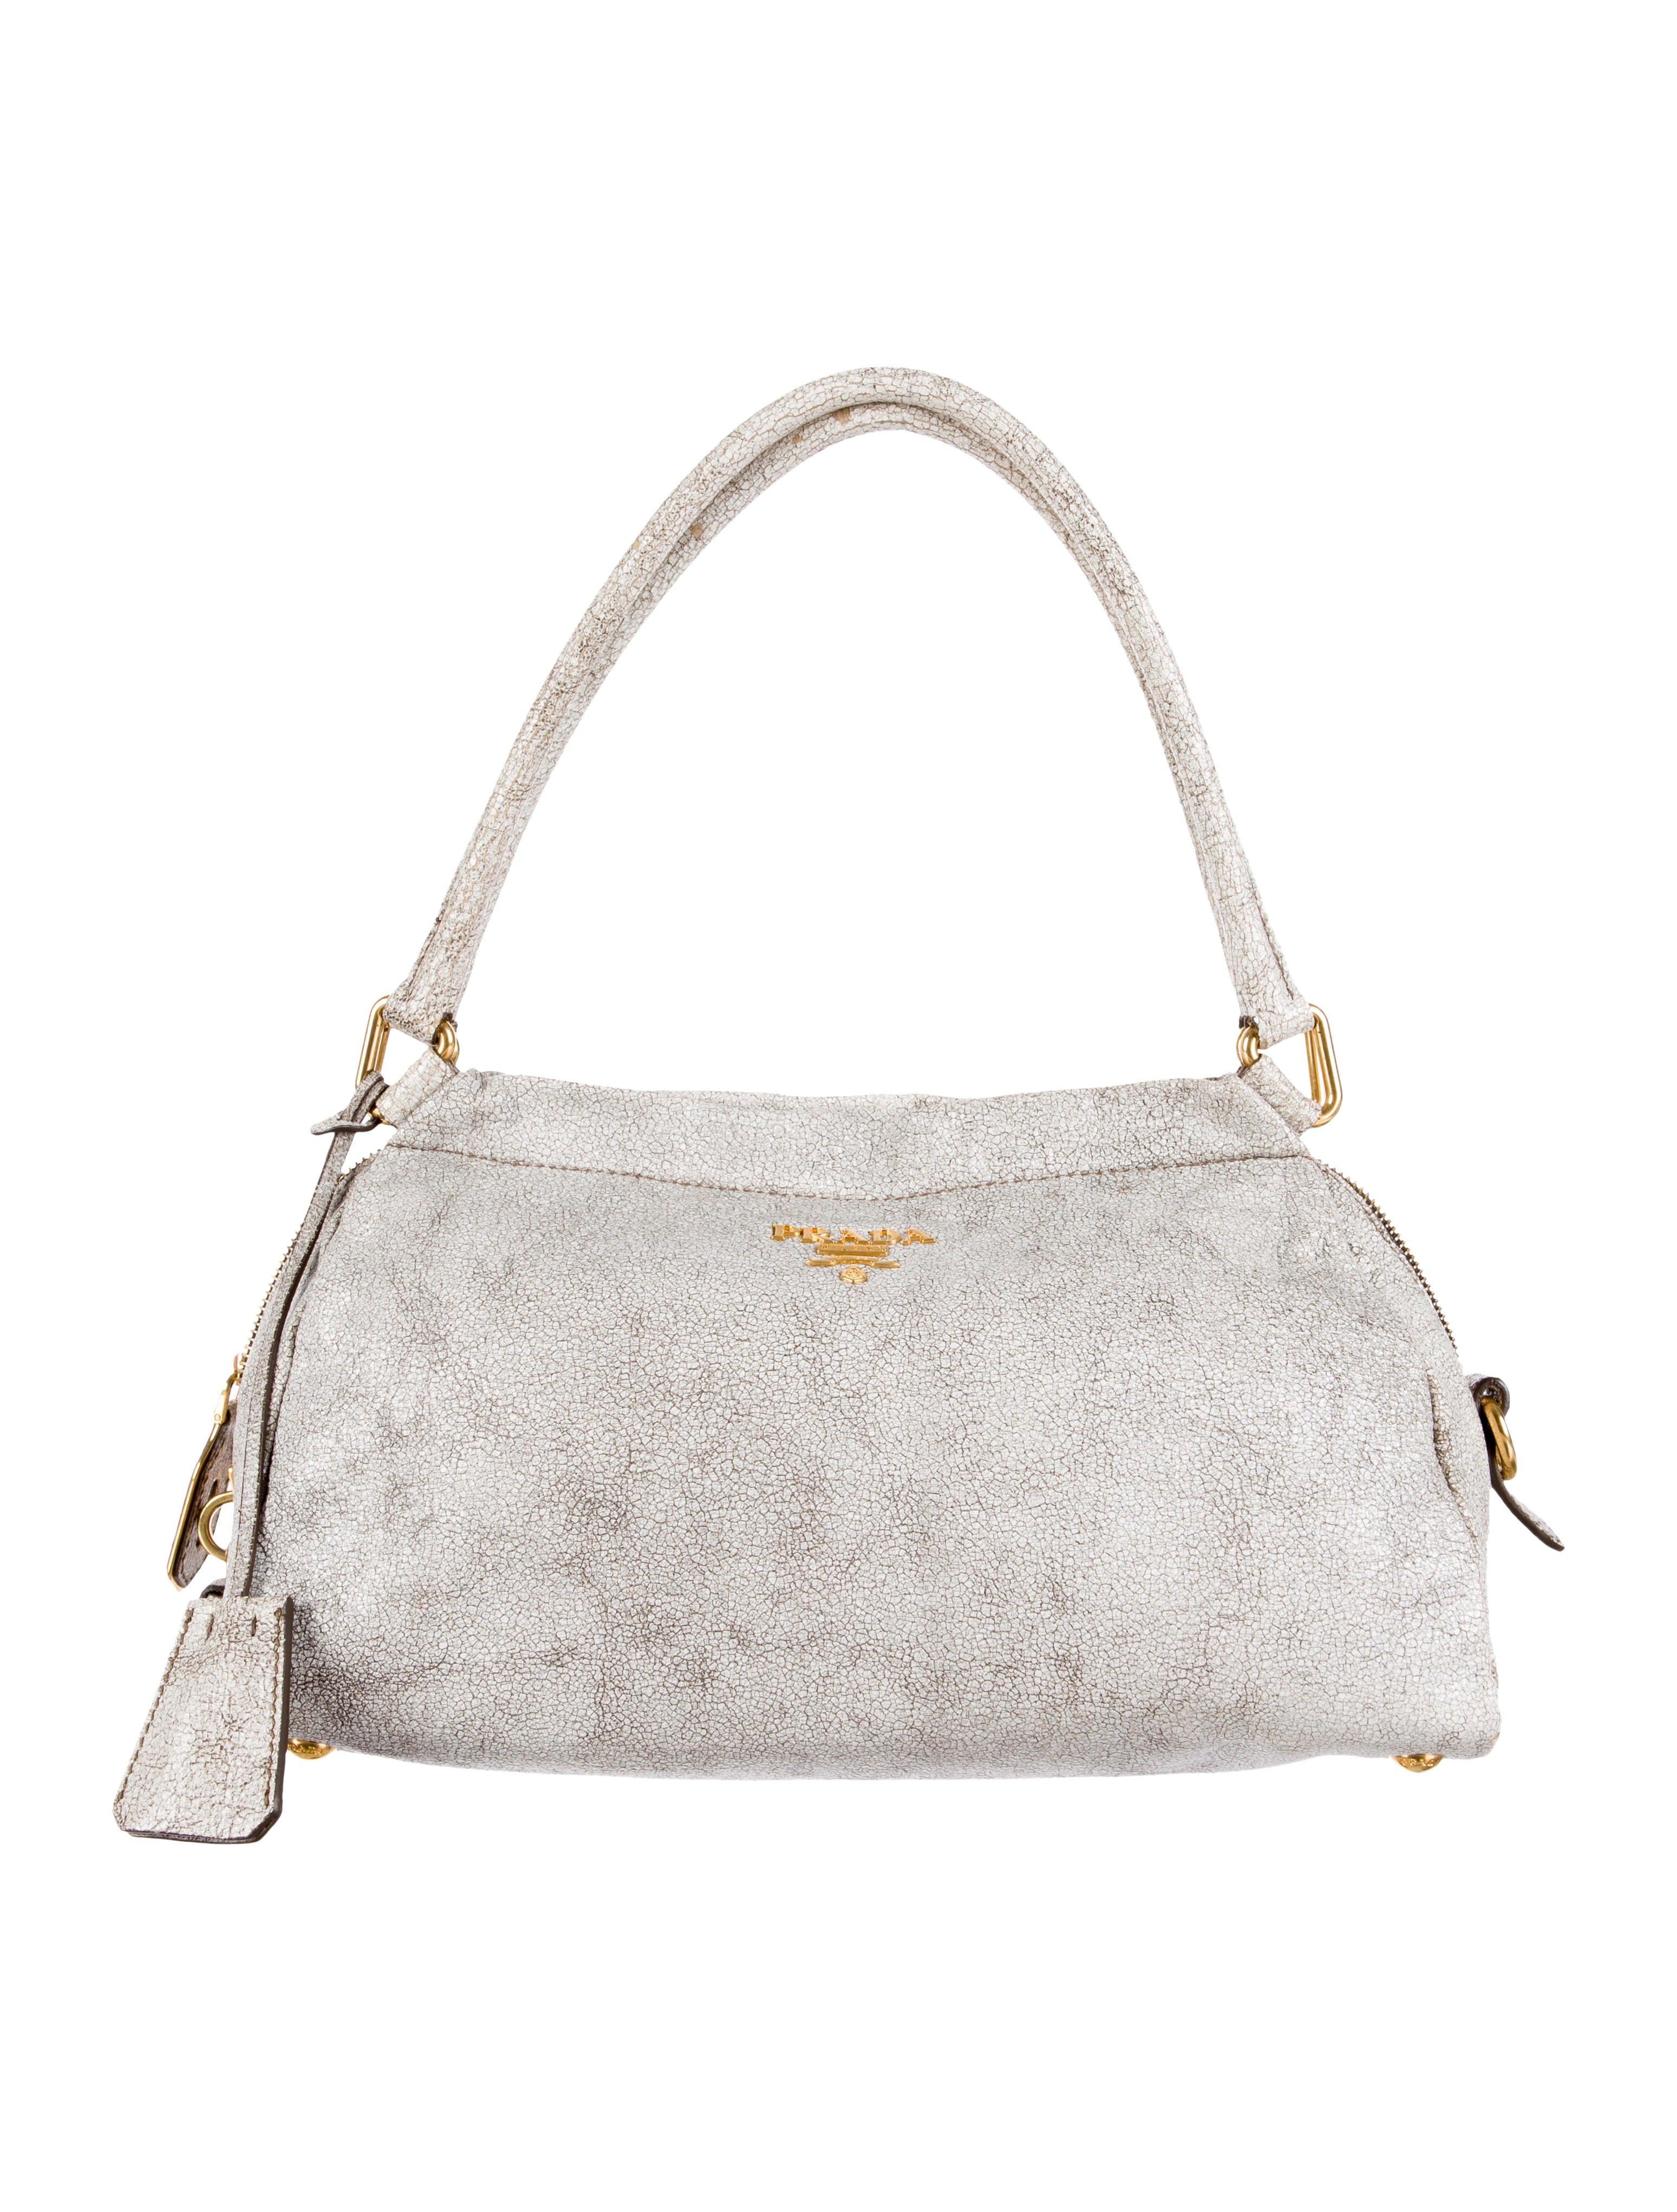 Prada Cracked Leather Handle Bag - Handbags - PRA82654 | The RealReal